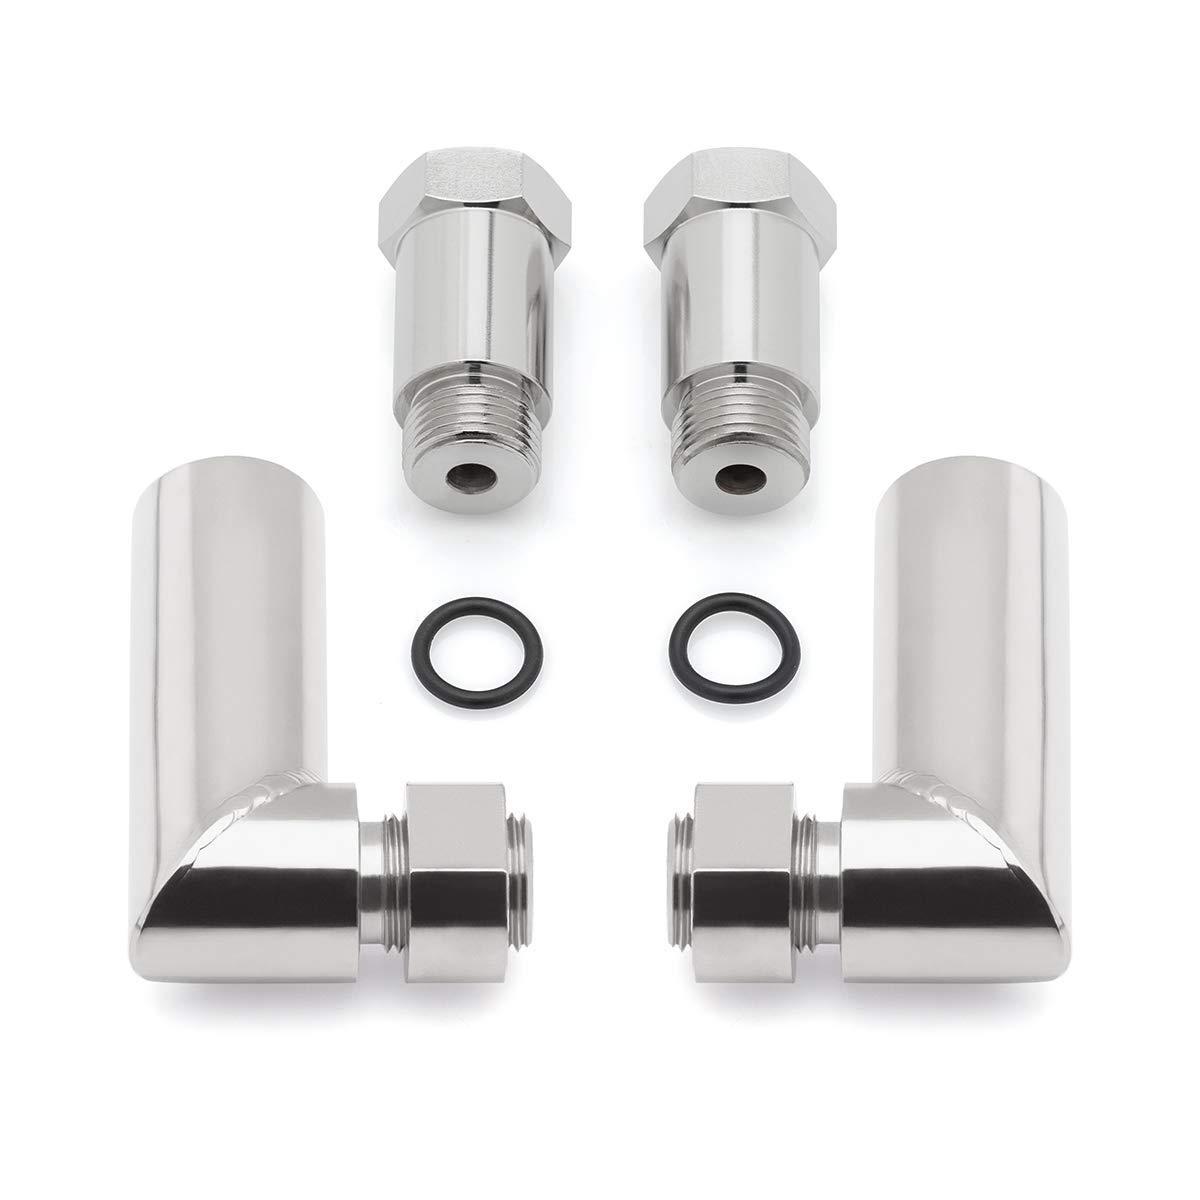 Oxygen Sensor Extender Header Pipe 90 Degree Angle Kit M18 x 1.5 Racing Off-road